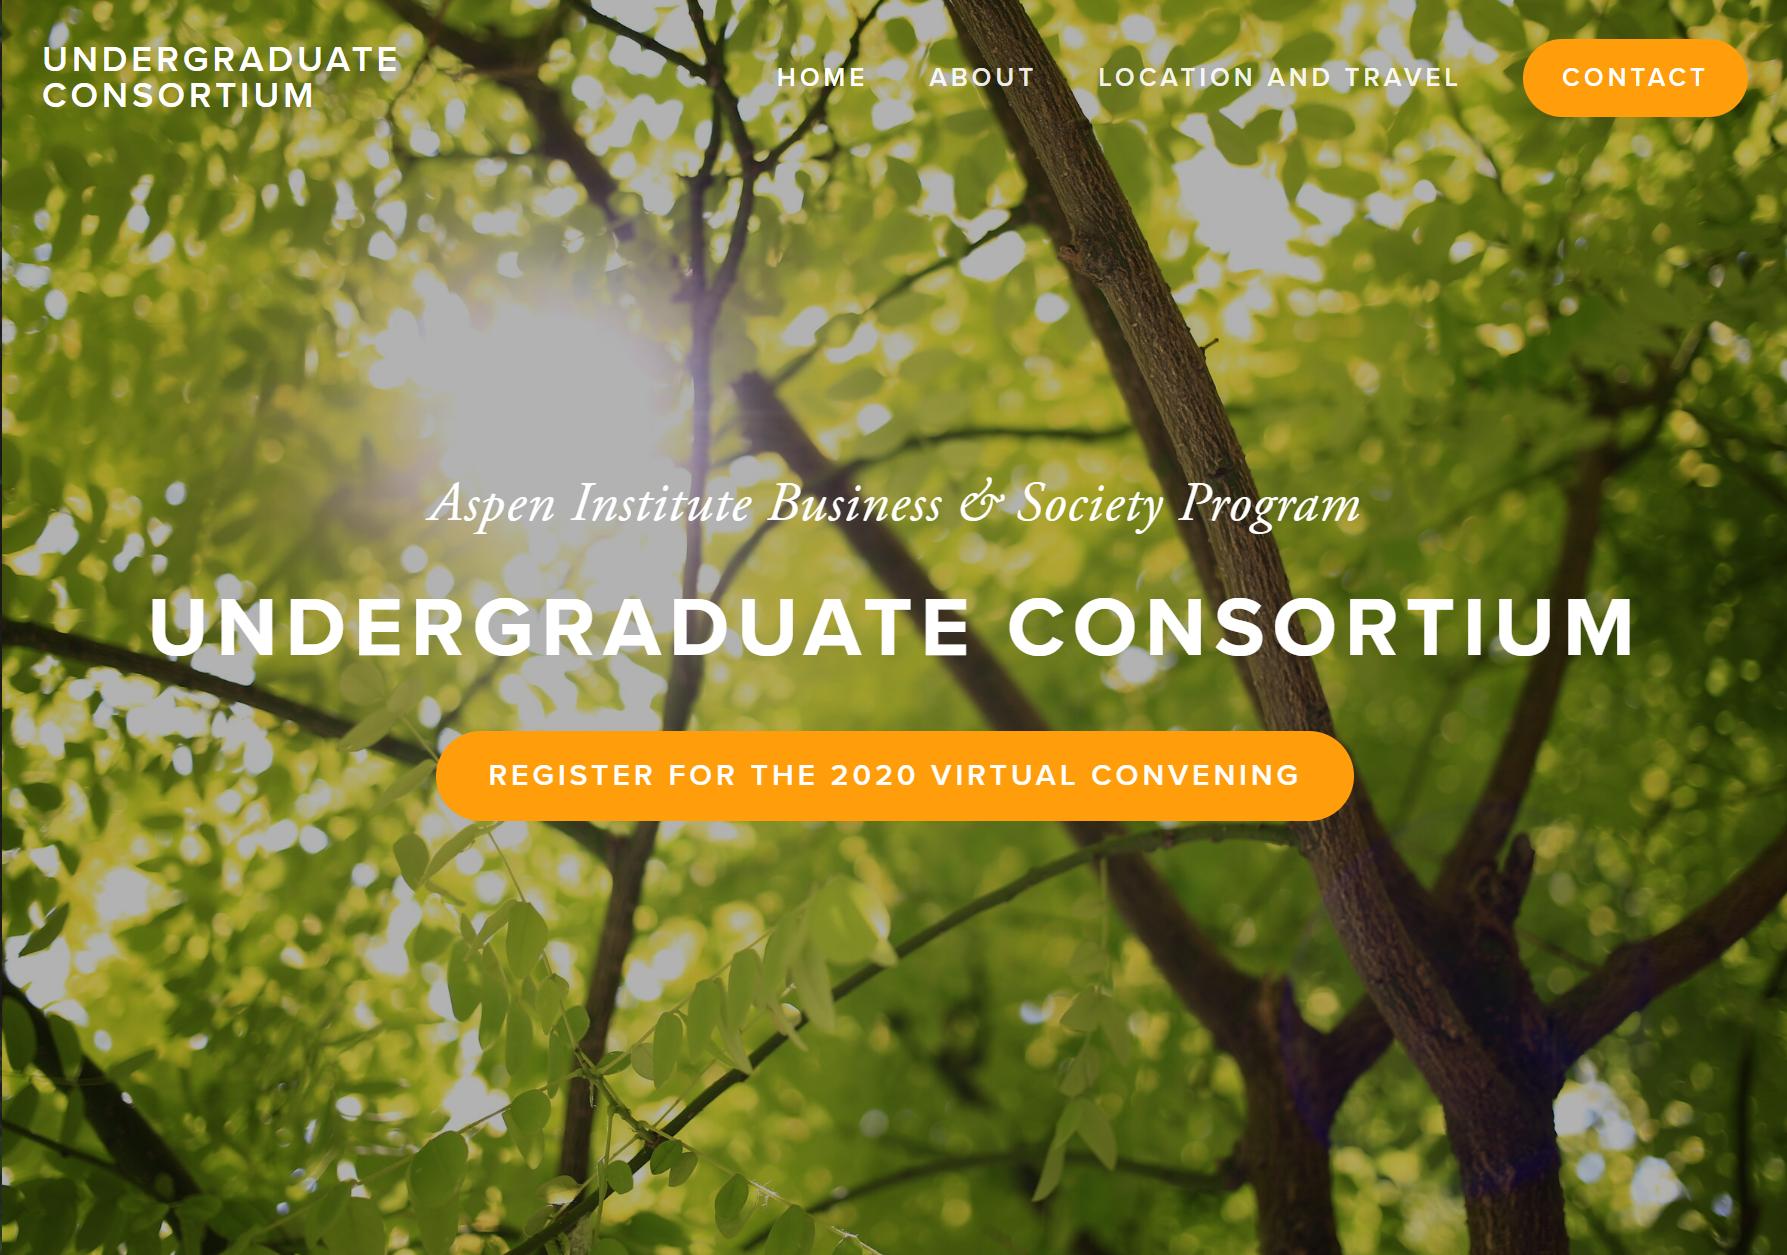 Business & Society Program 2020 Undergraduate Convening